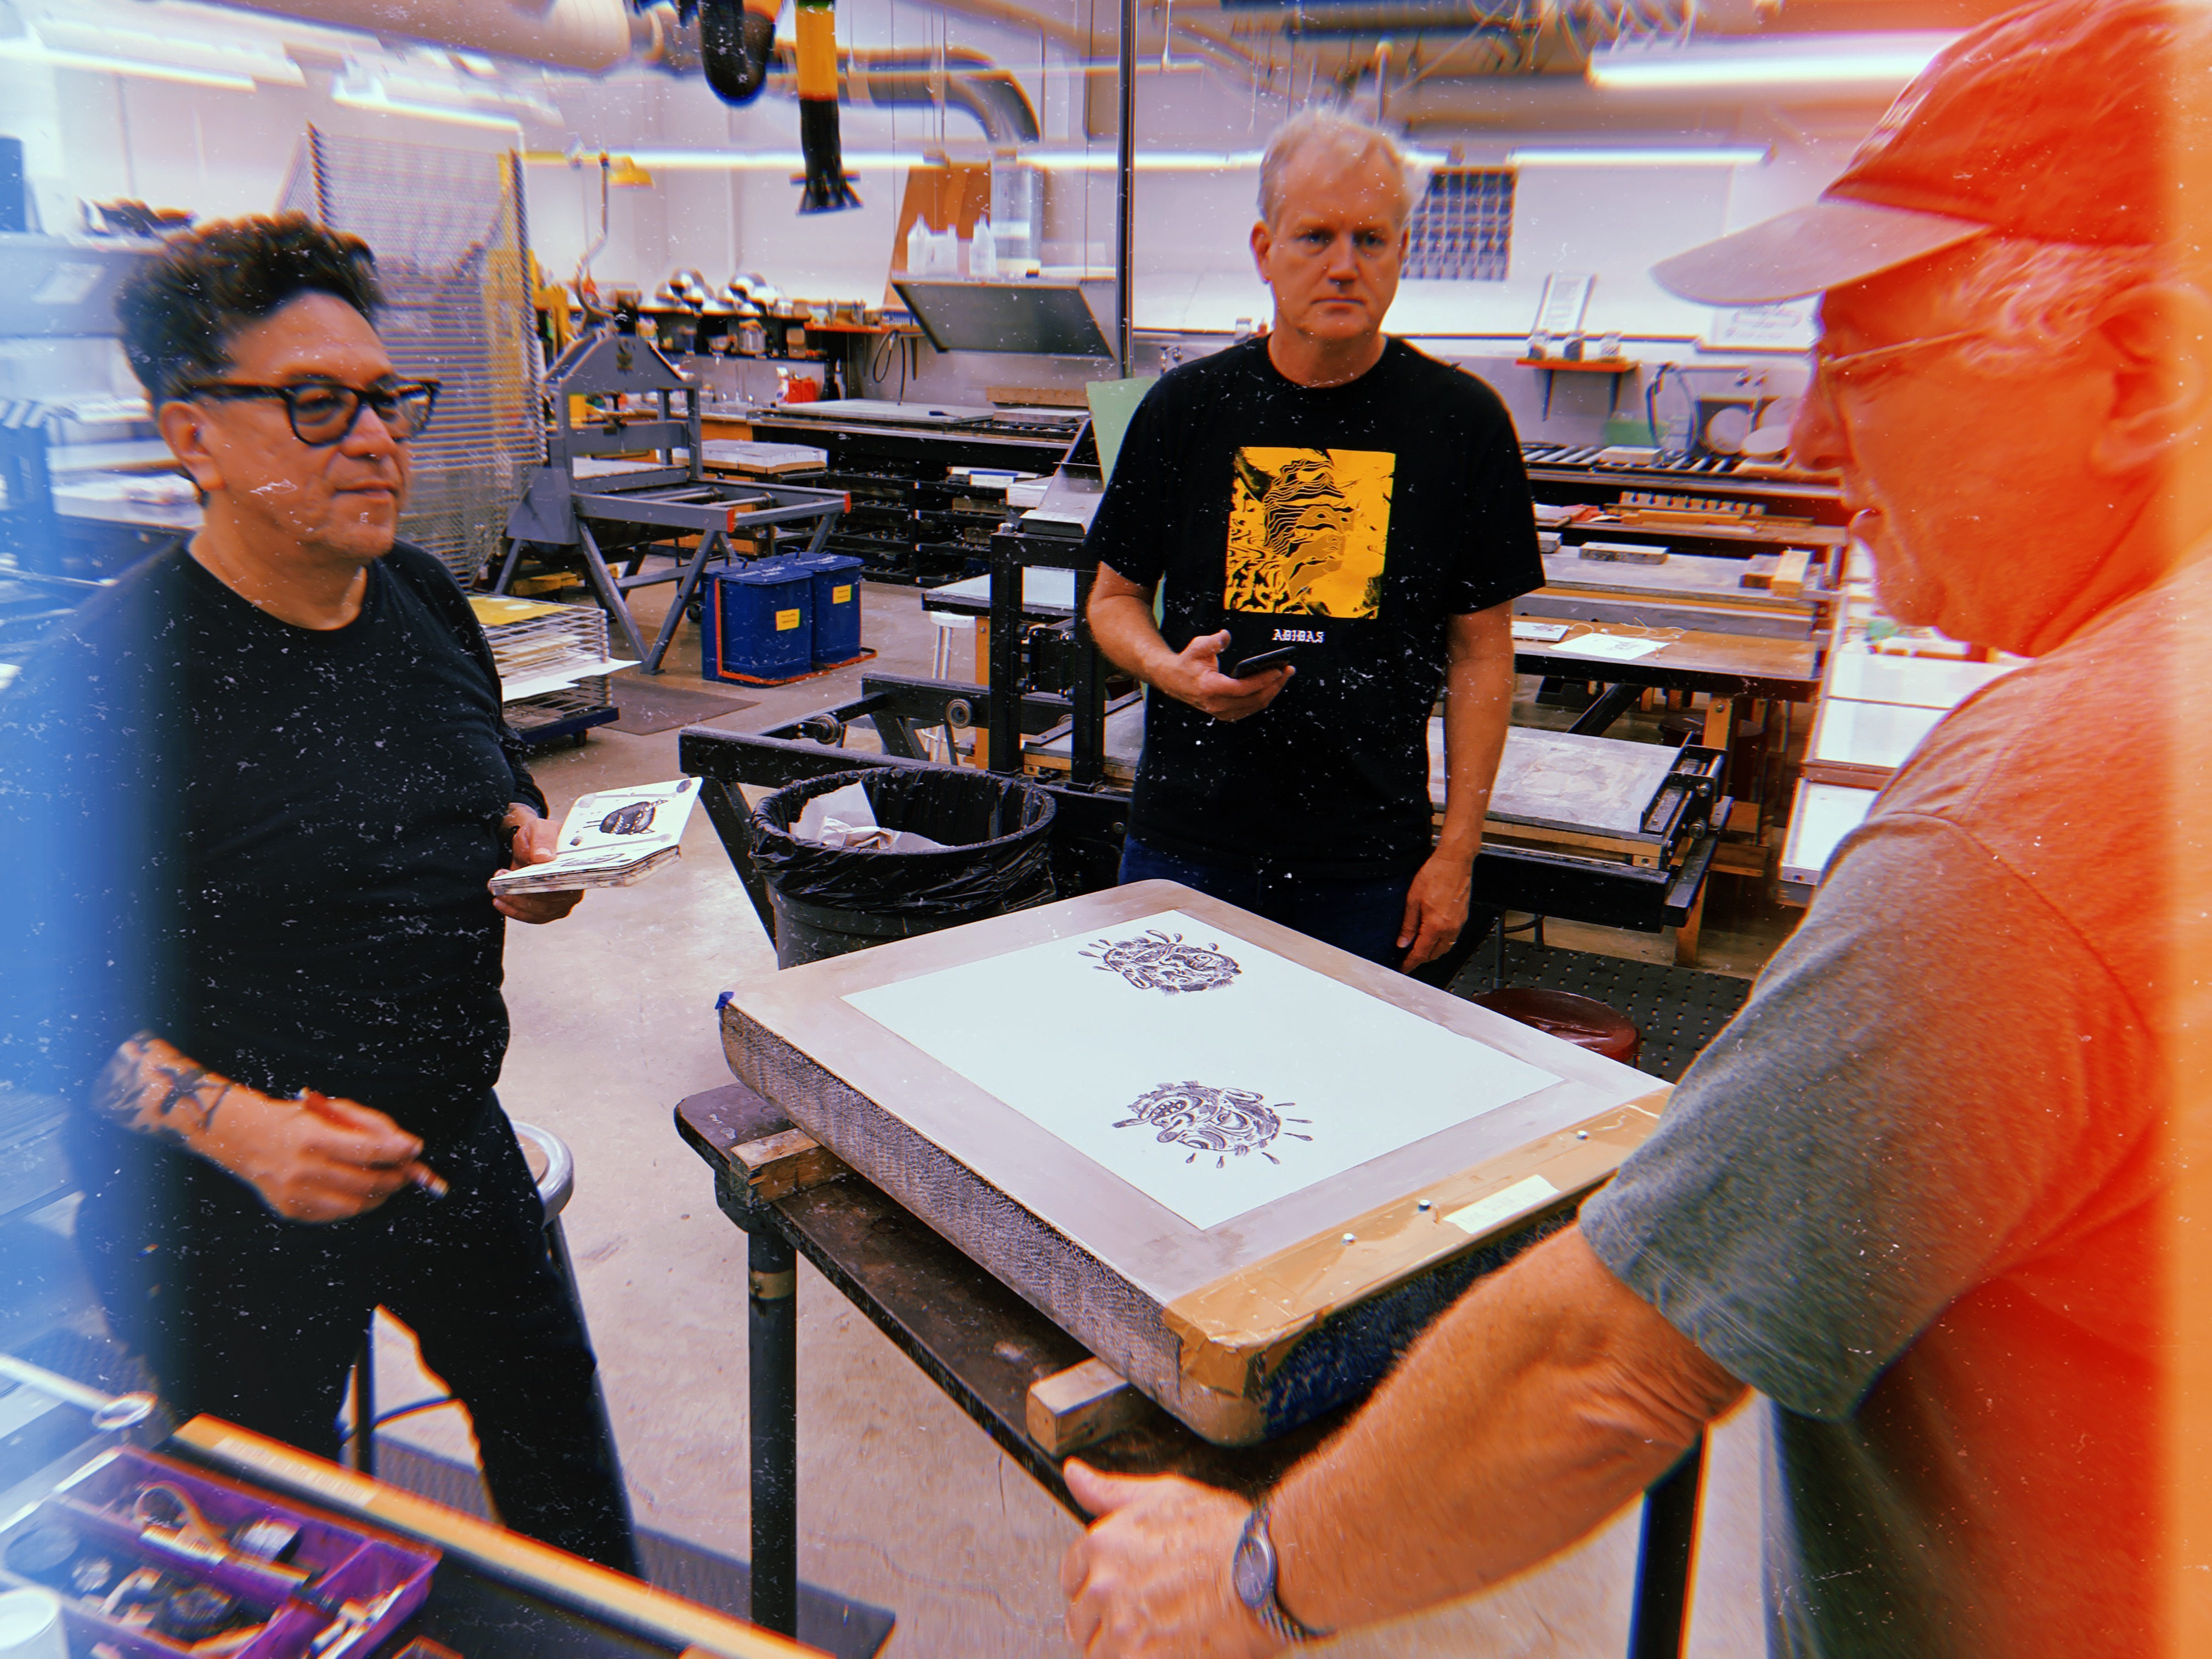 Visting Artists